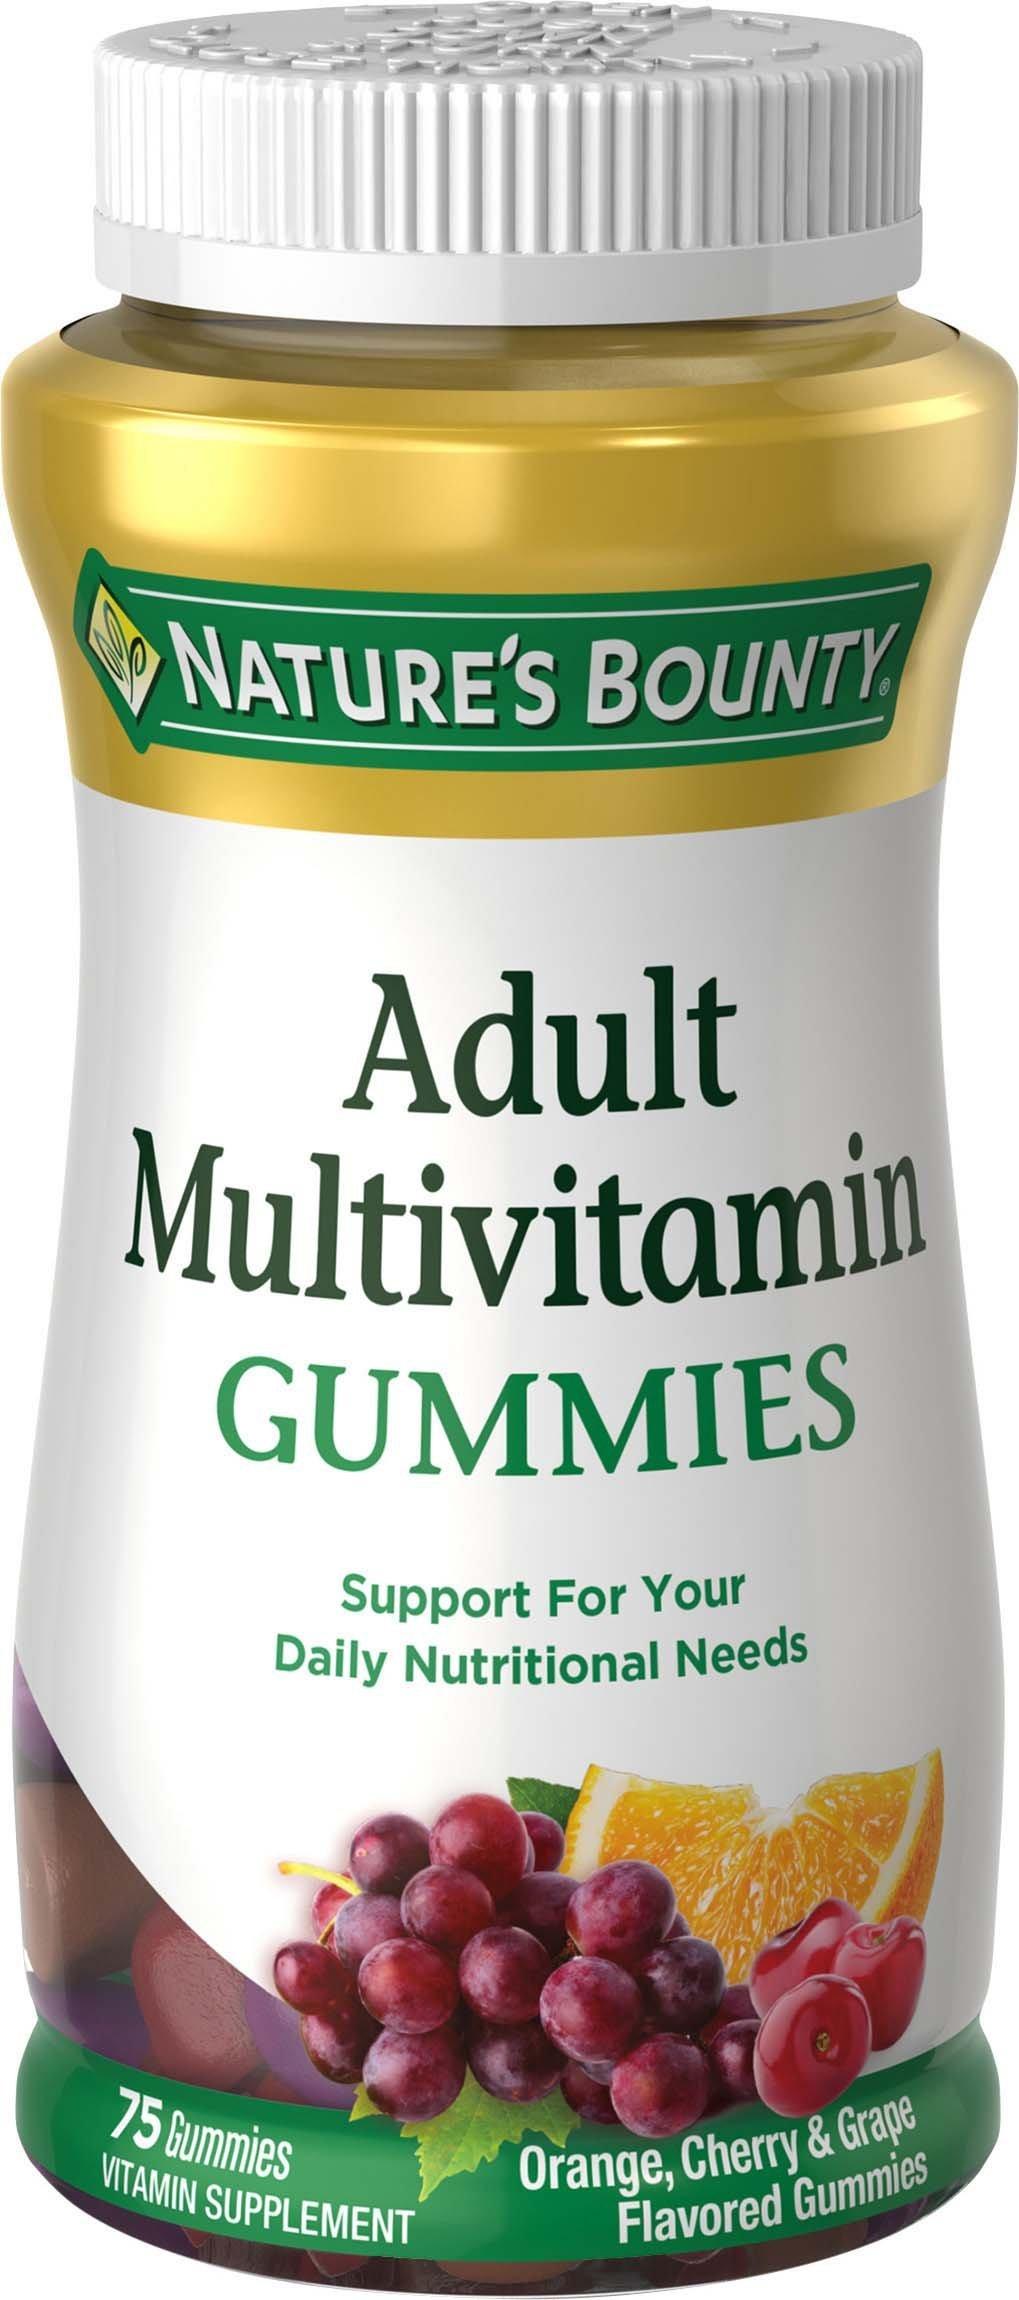 bounty gummies nature adult melatonin orange theanine cherry sleep multi package grape mg multivitamin ct complex vary natures count amazon